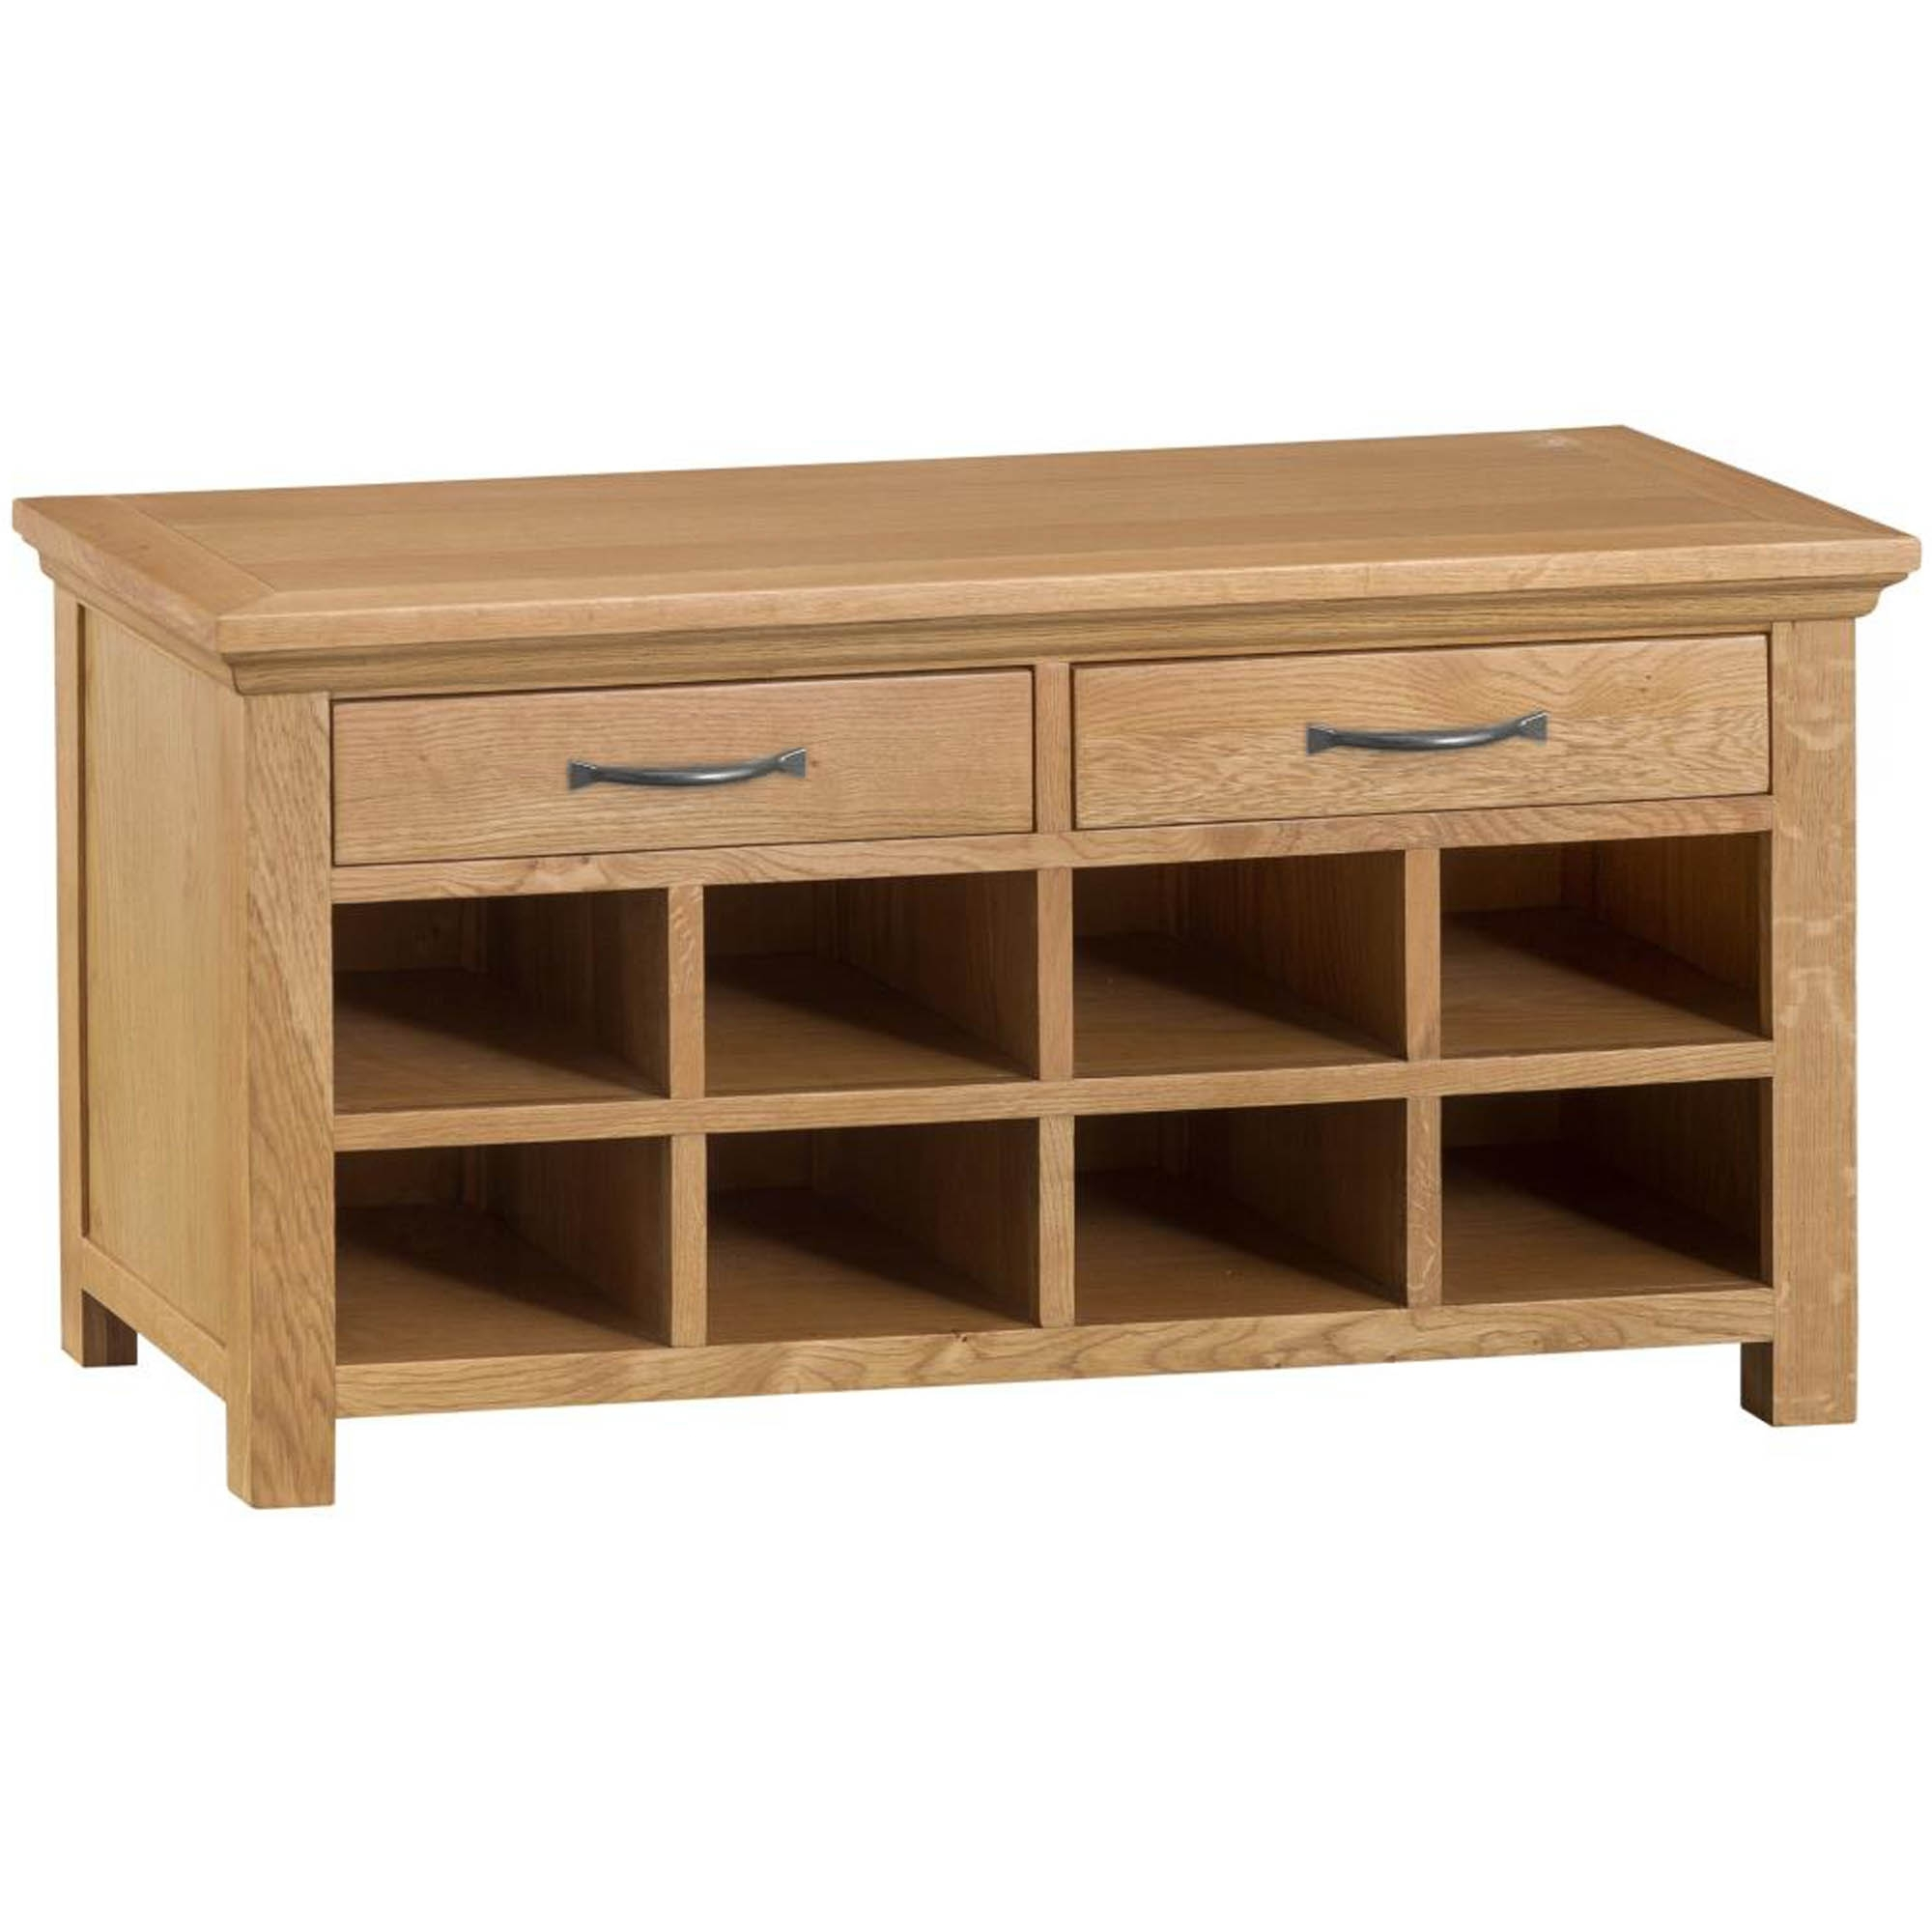 Madison indoor bench modern furniture wood furniture